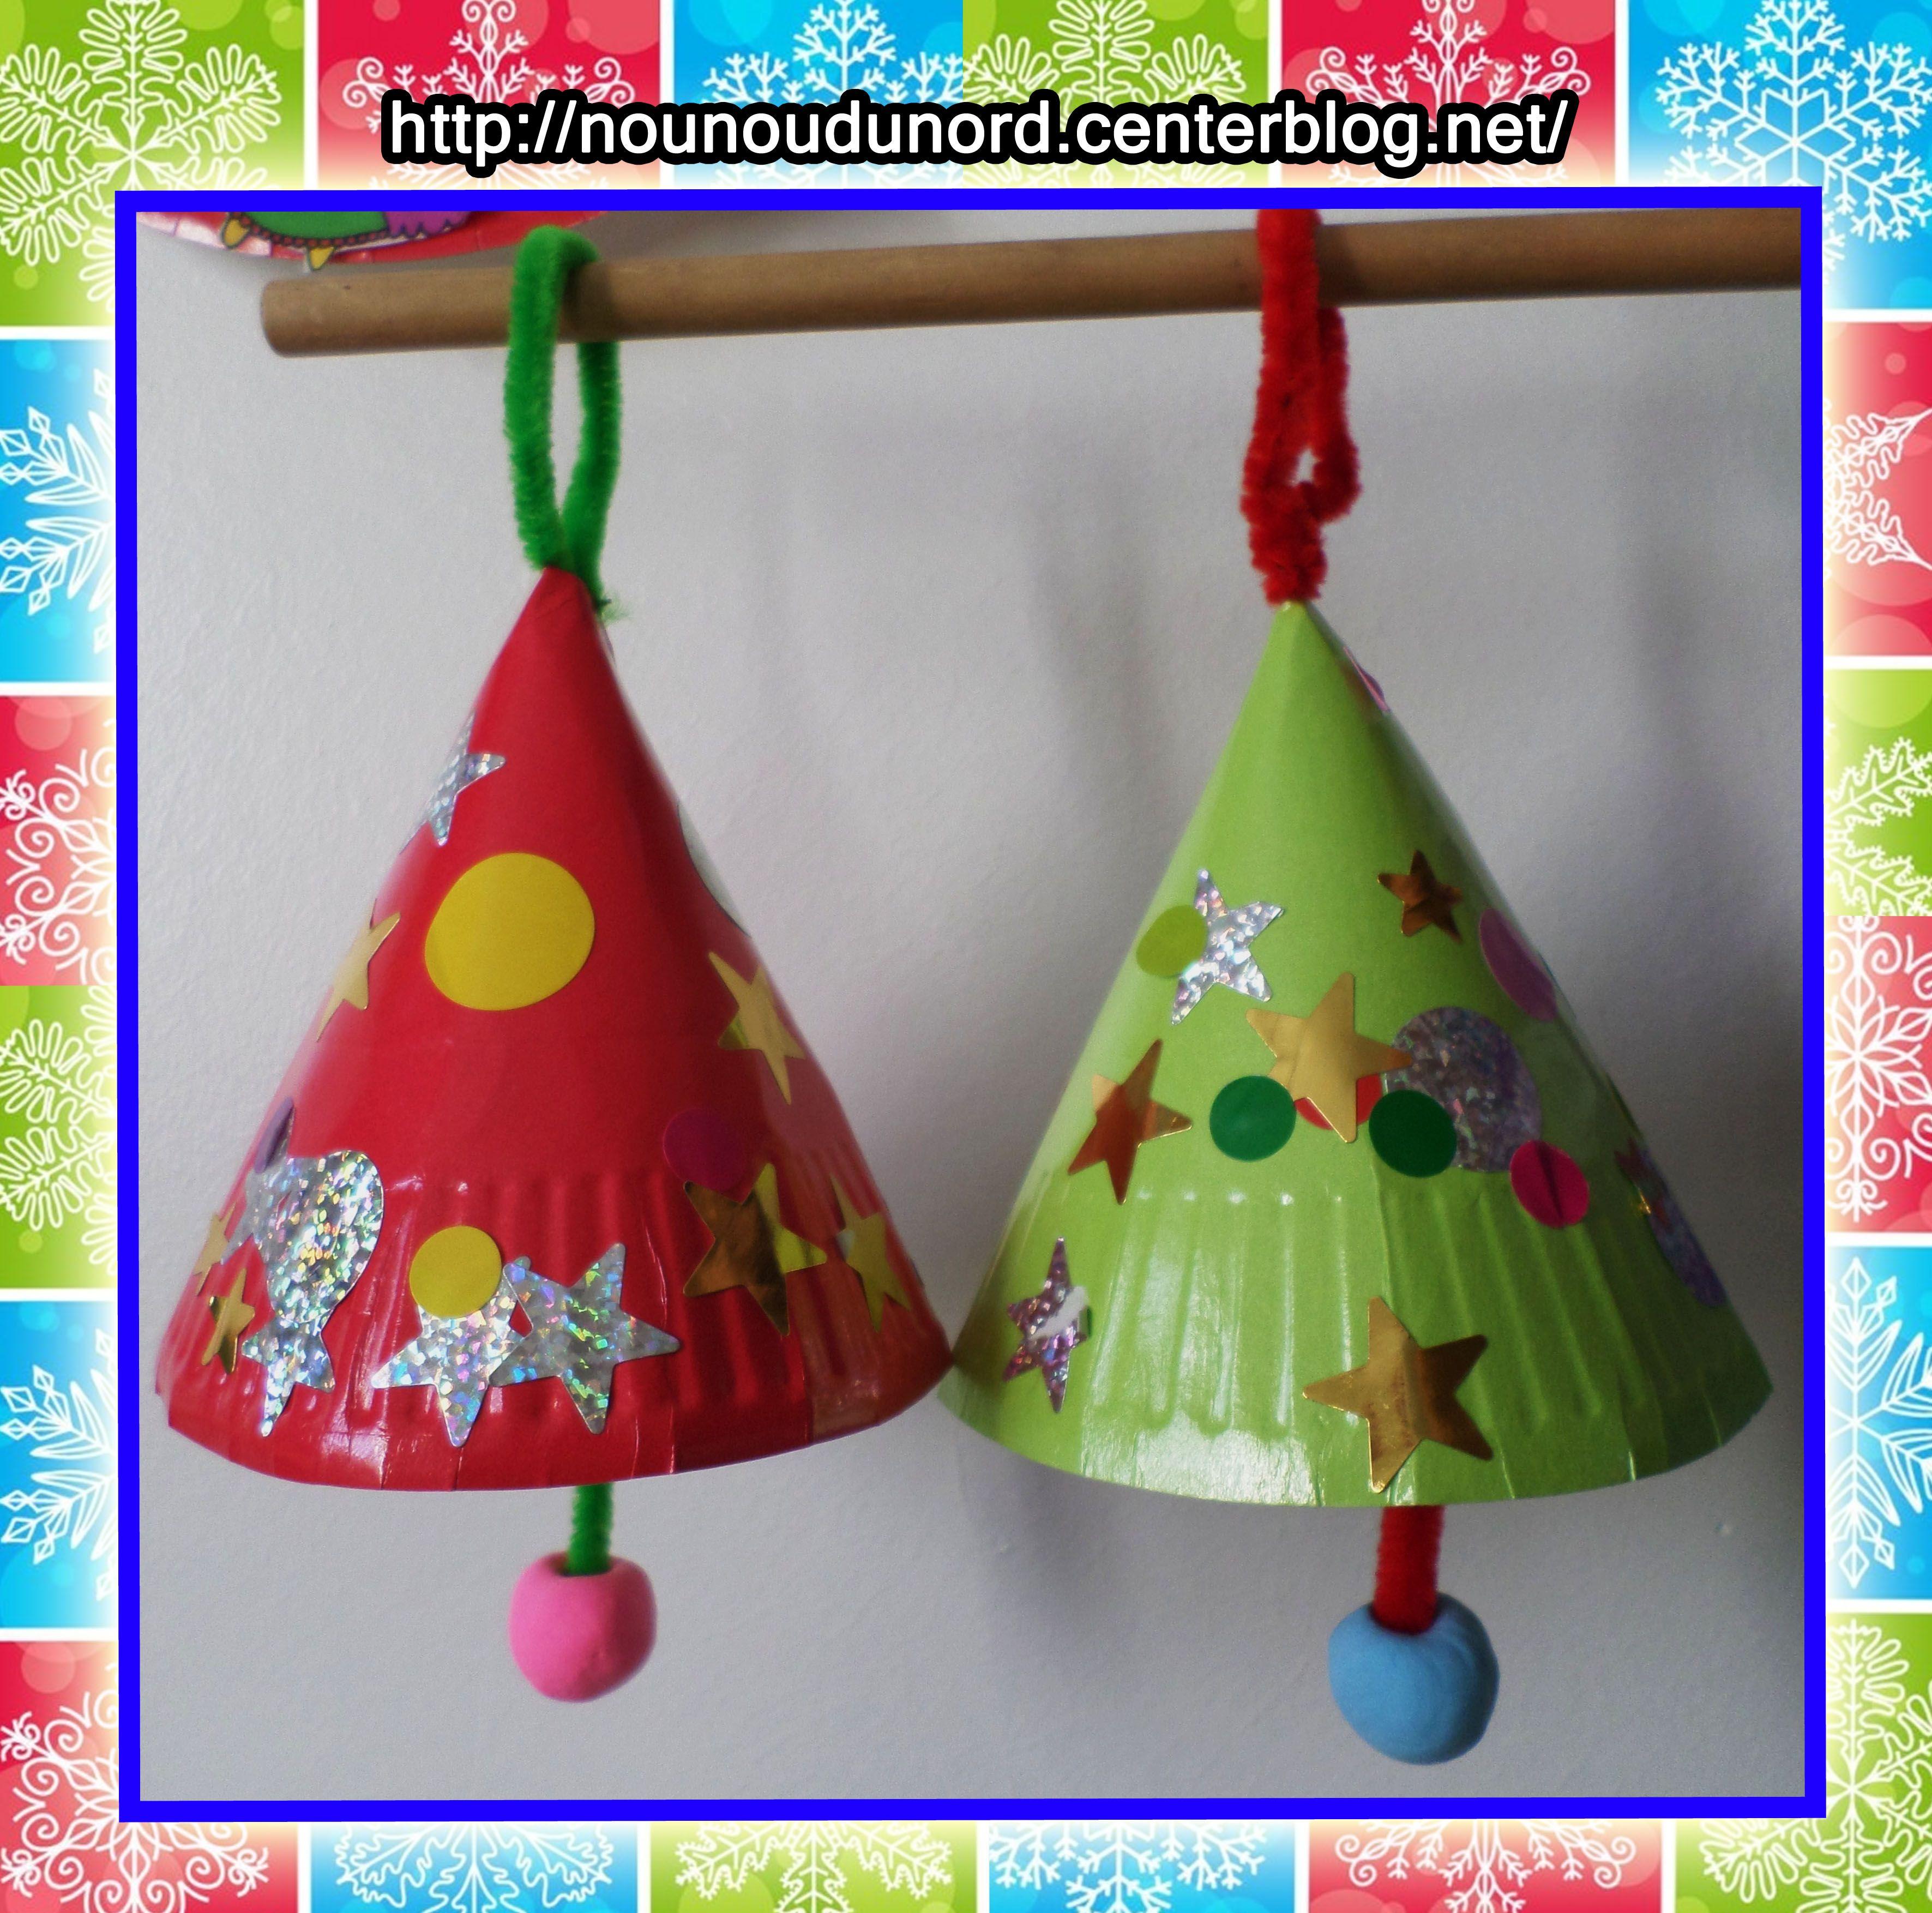 Cloches de no l r alis es avec des assiettes en carton for Weihnachtsideen 2014